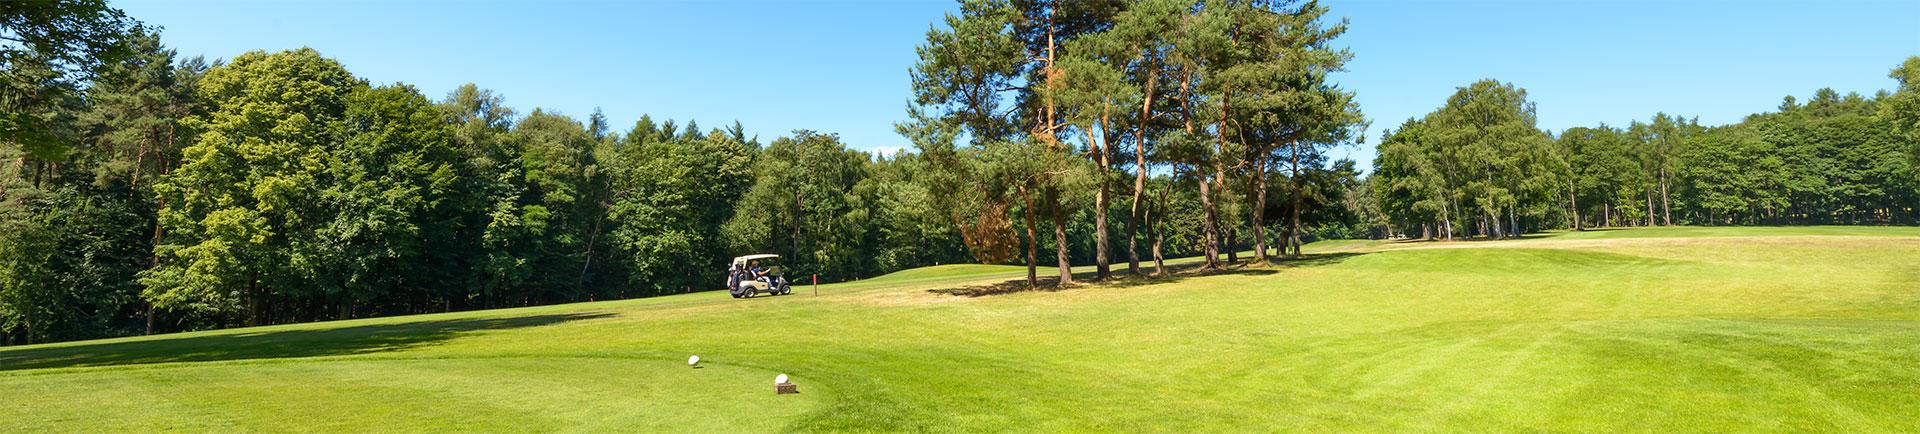 rheinblick-golfcourse-5